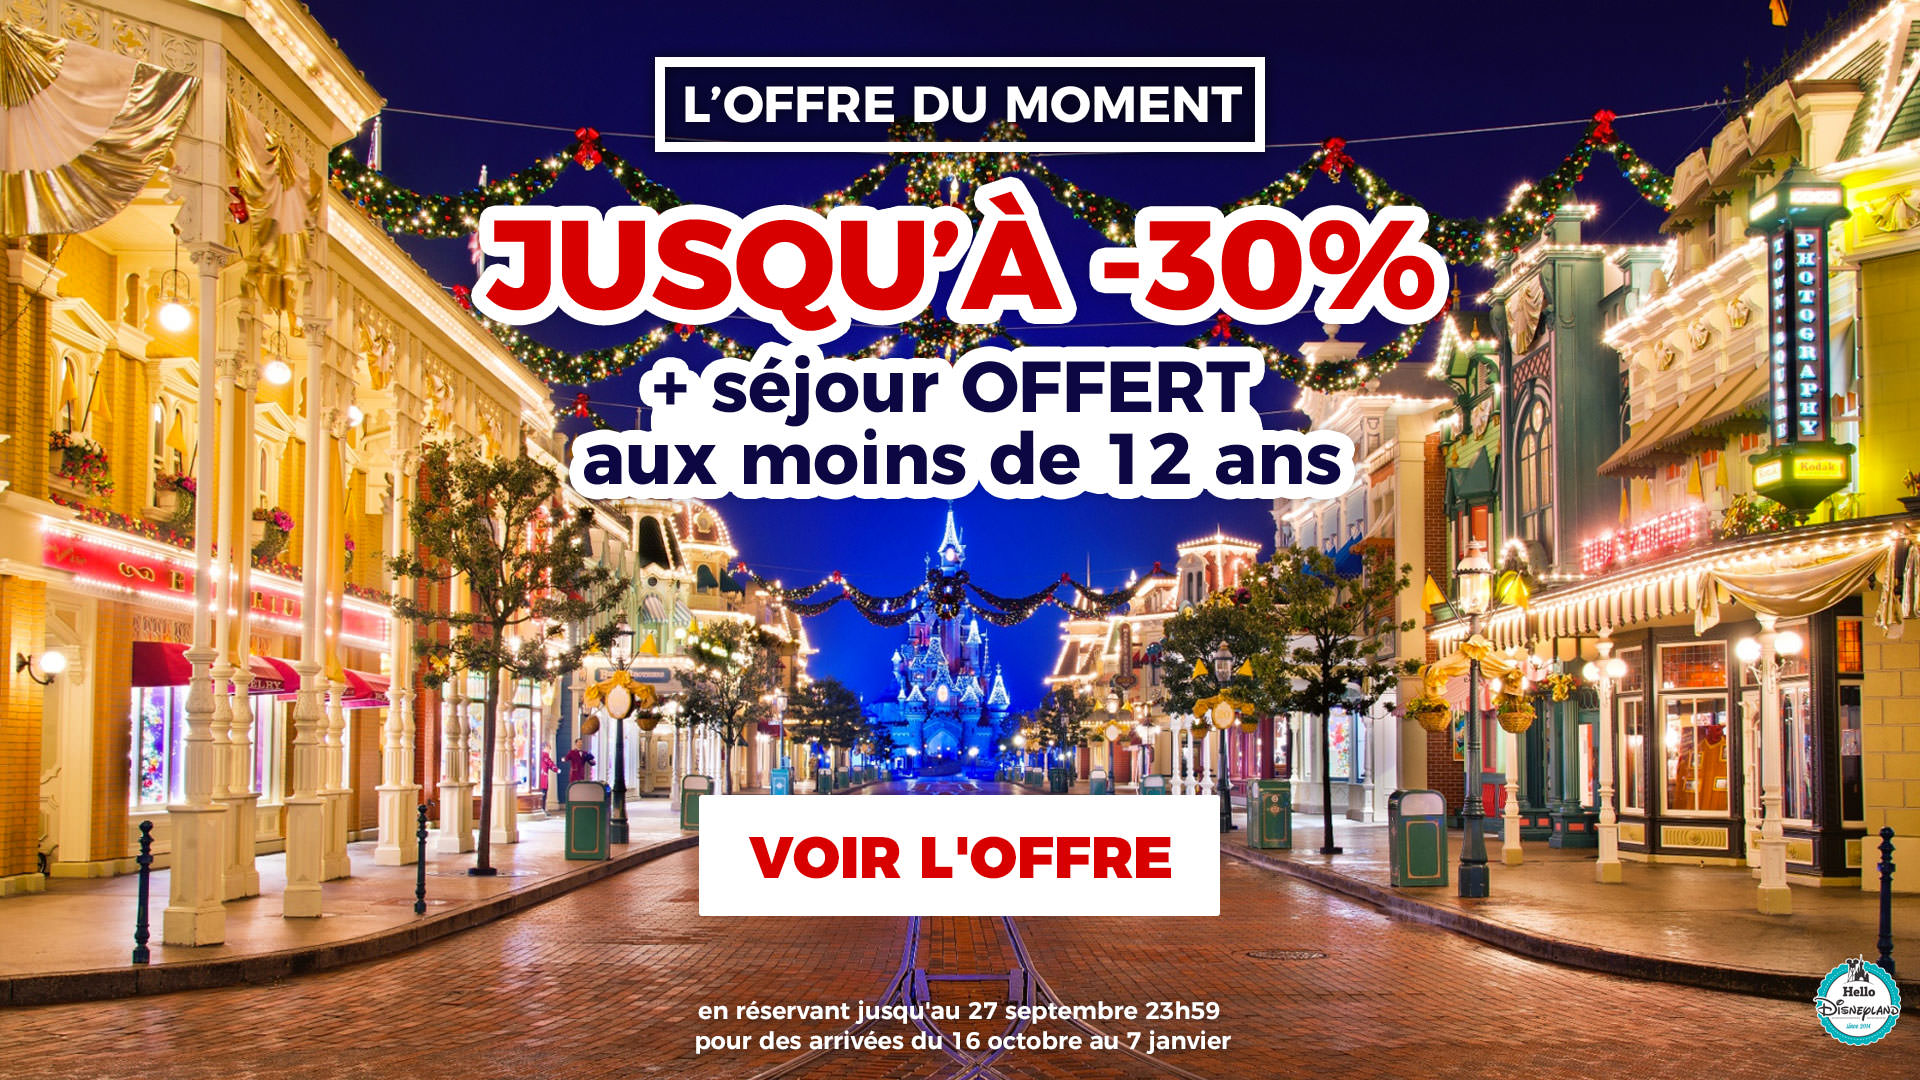 eurodisney offre noel 2018 Hello Disneyland : Le blog n°1 sur Disneyland Paris | Promo  eurodisney offre noel 2018